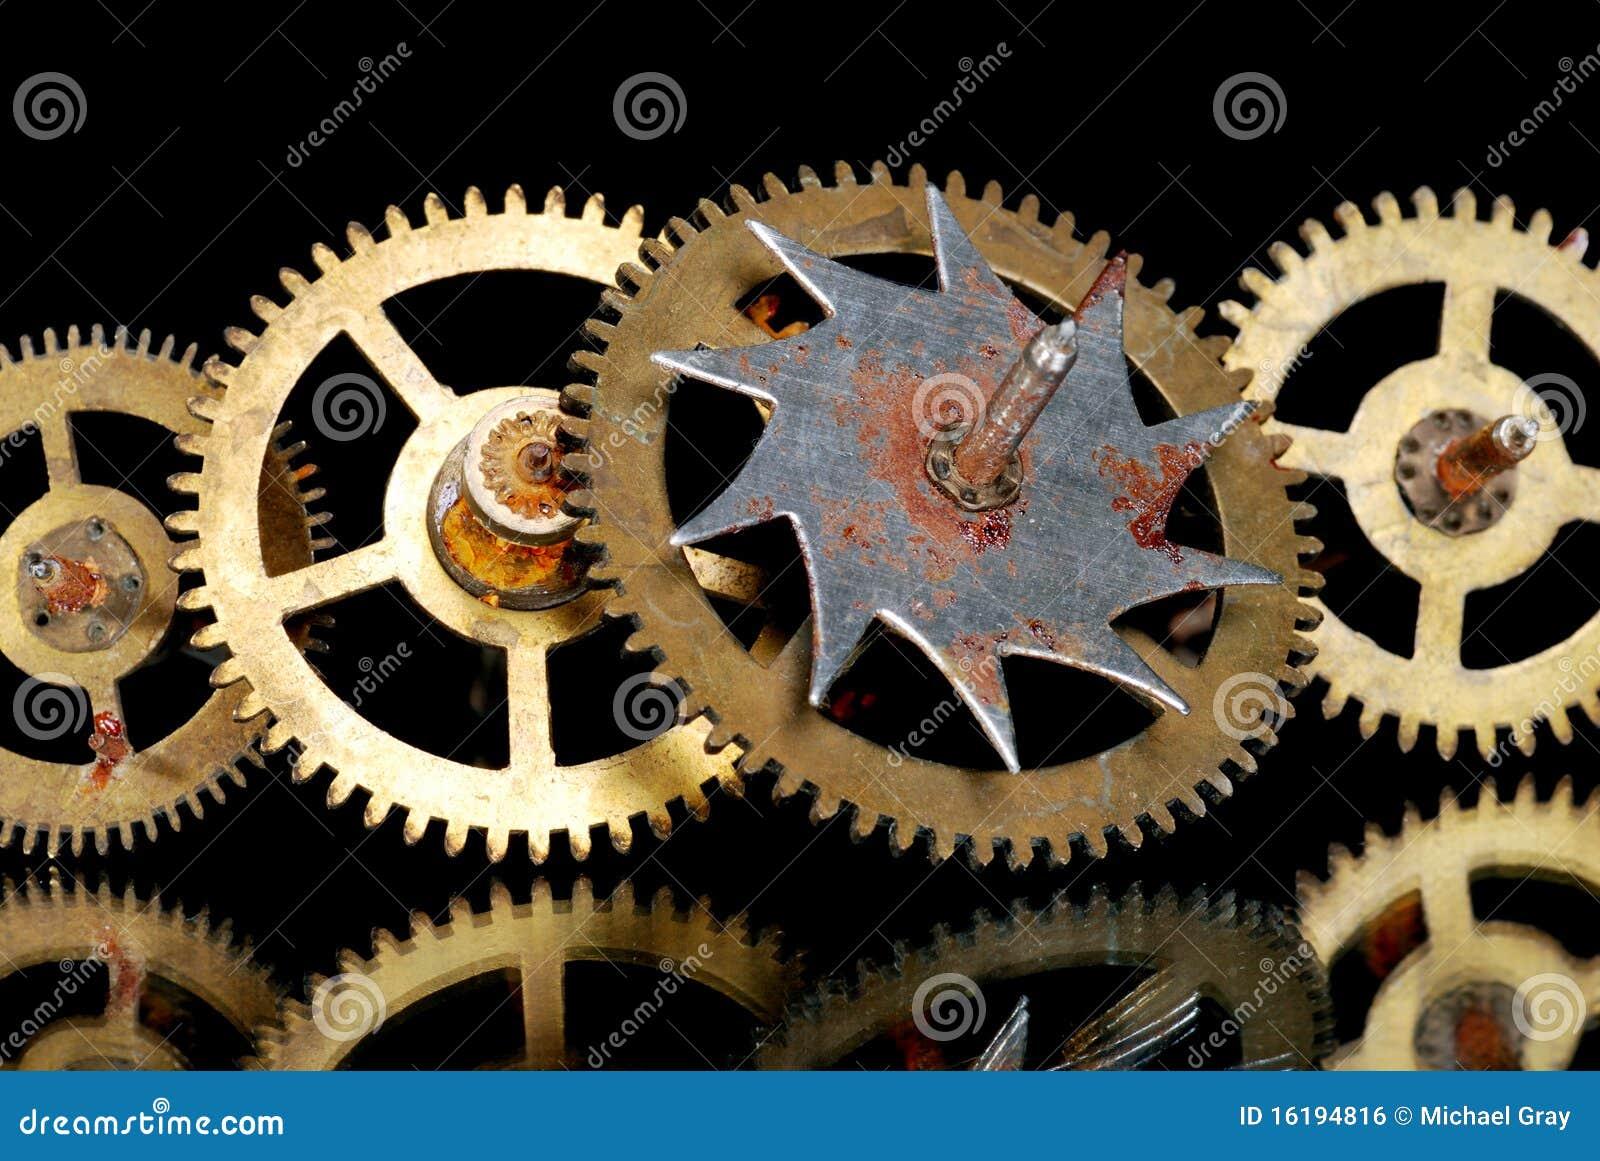 Old Clock Gears : Macro of rusty old clock gears royalty free stock image